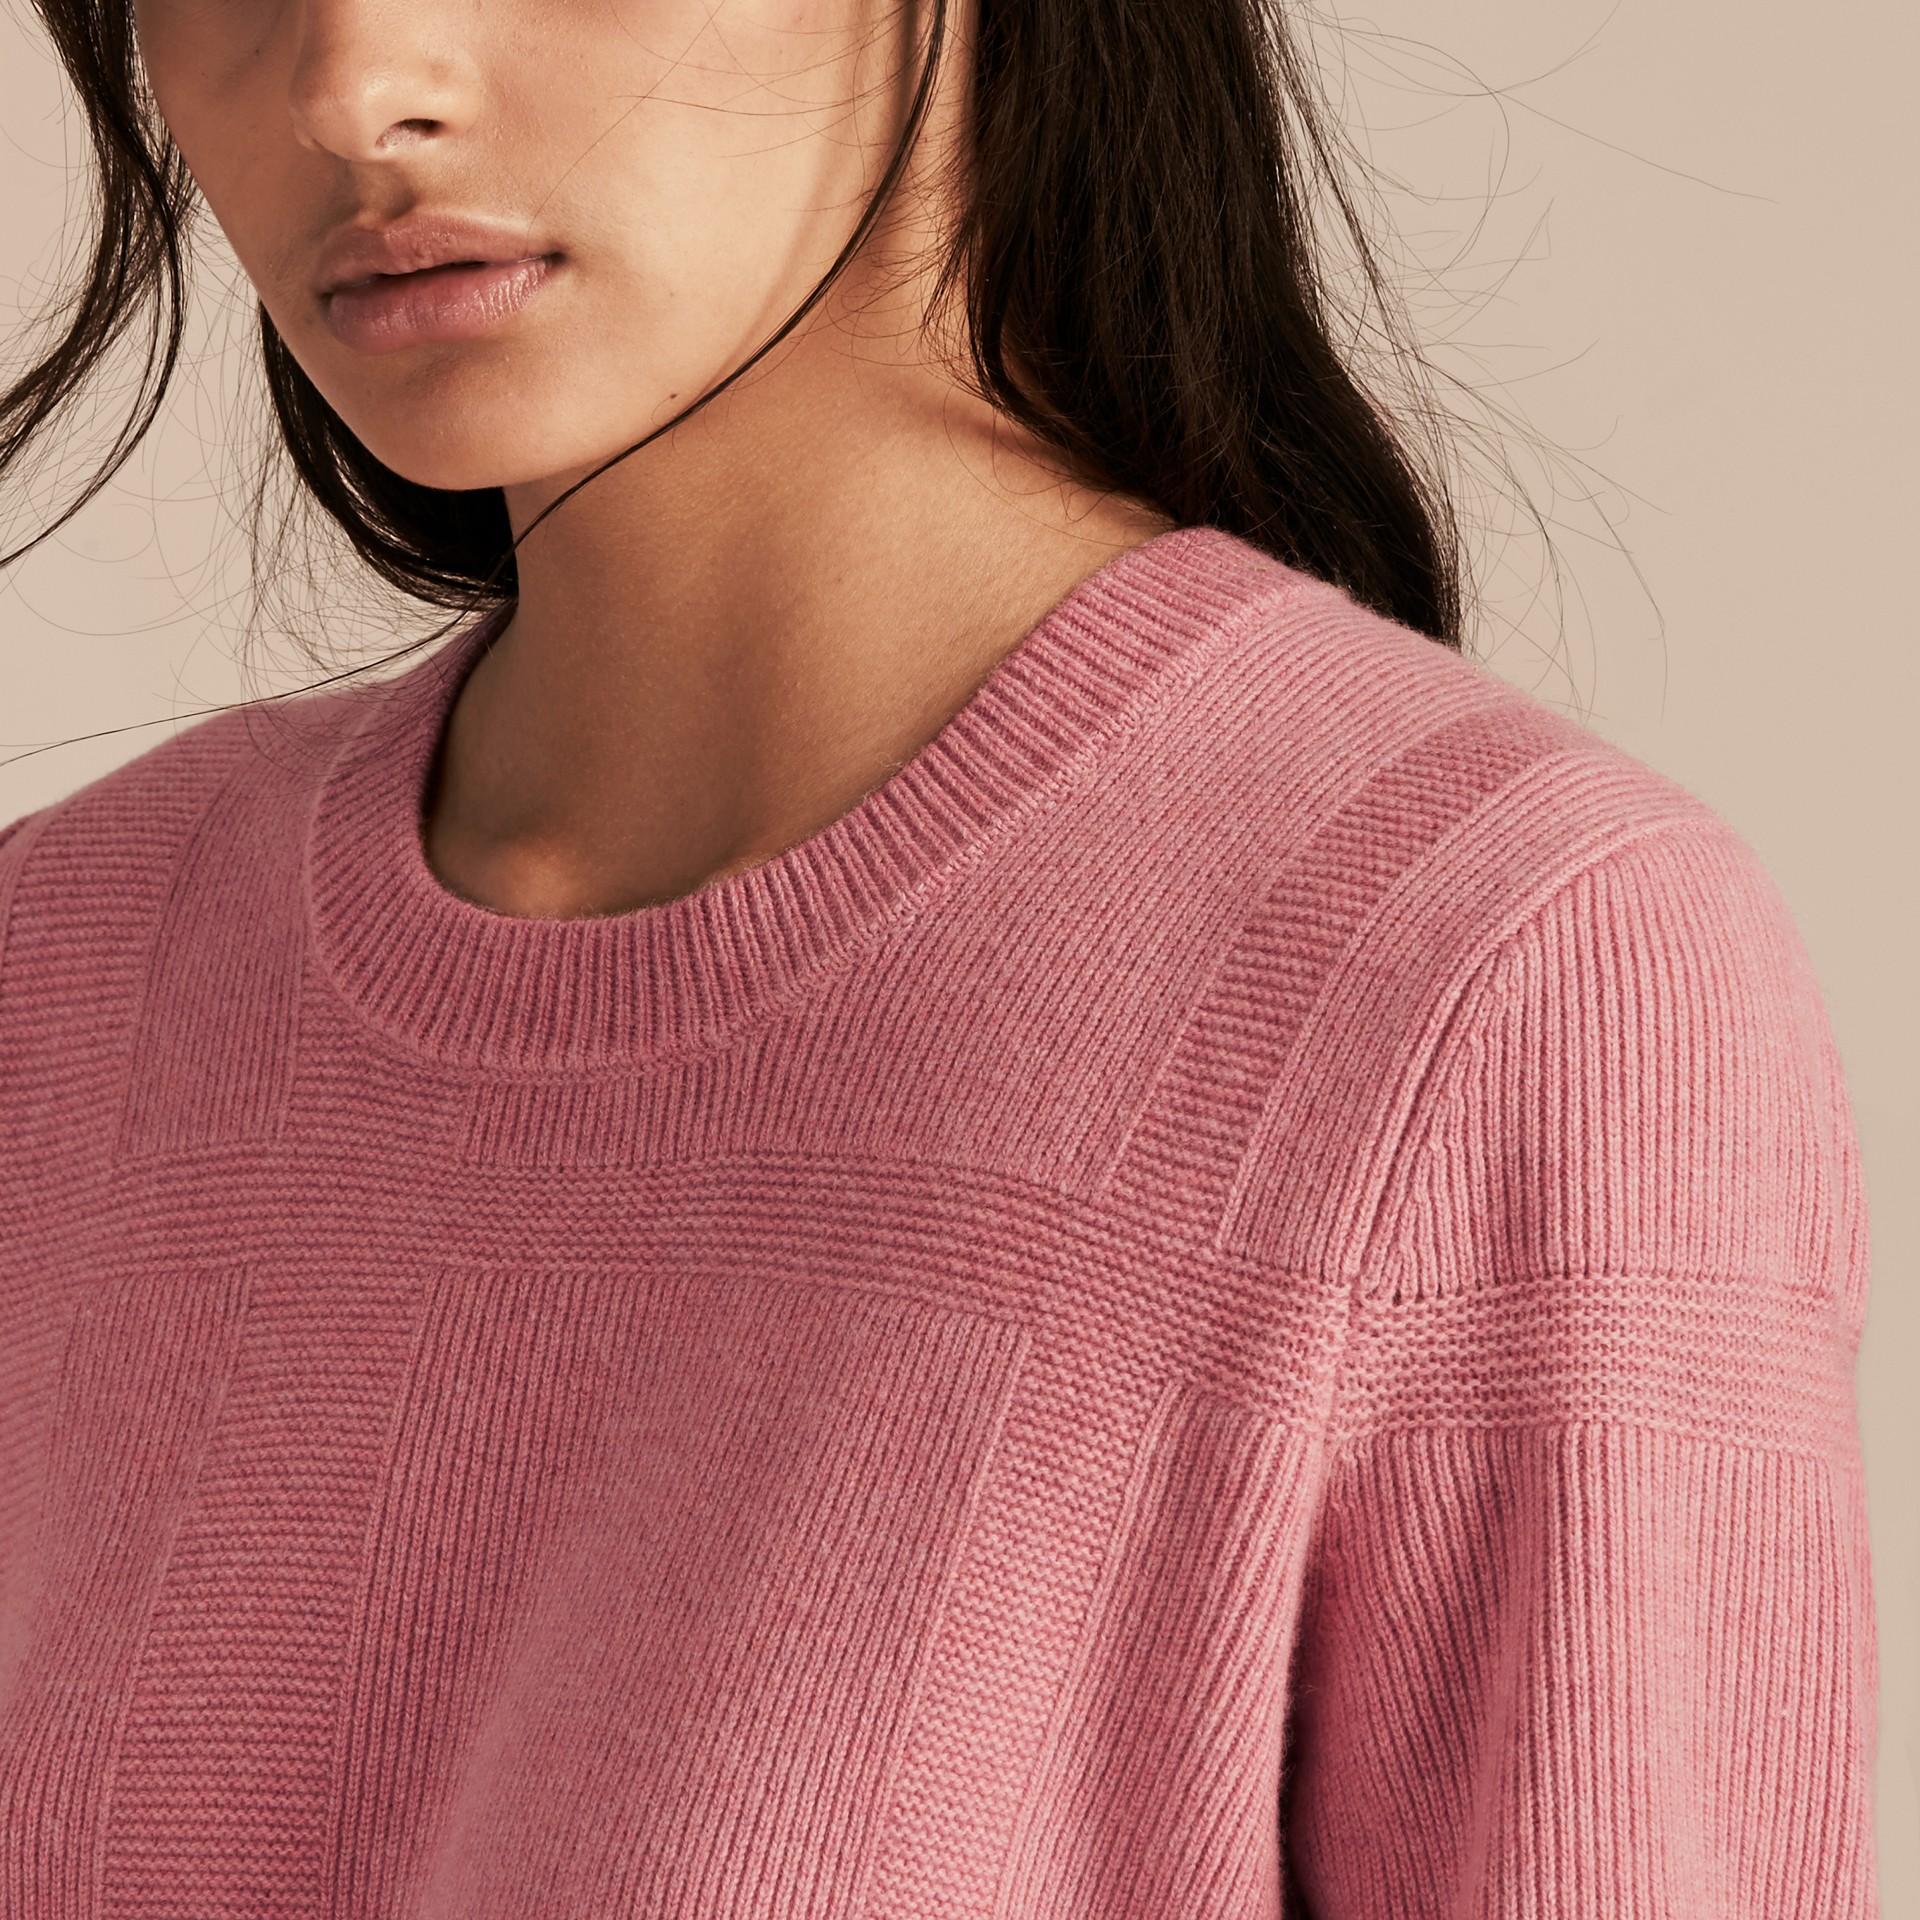 Hydrangea pink melange Check-knit Wool Cashmere Sweater Hydrangea Pink Melange - gallery image 5